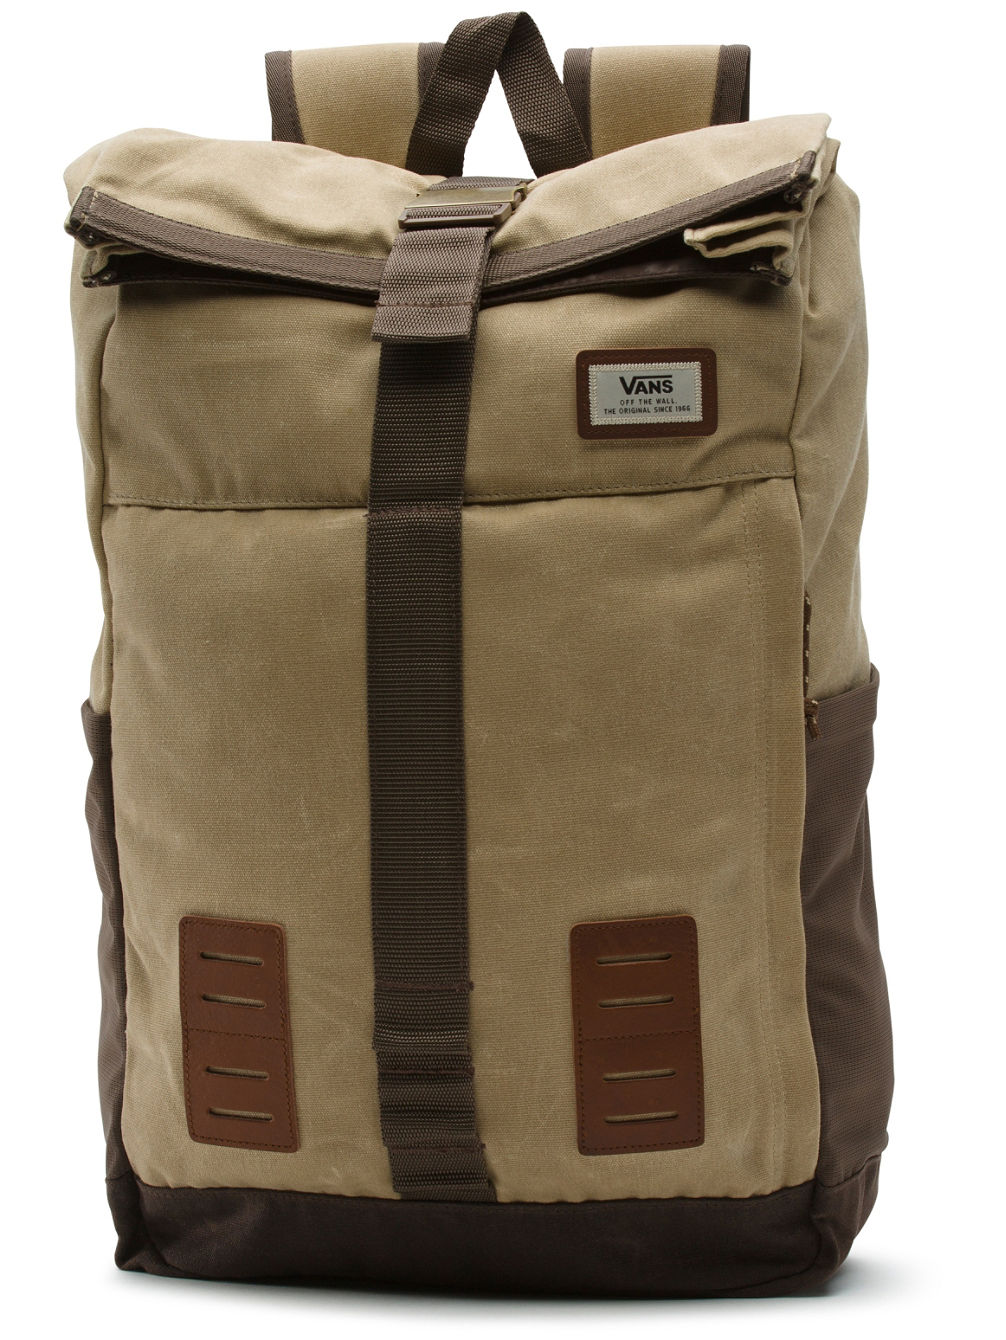 Vans Plot Roll Top Backpack